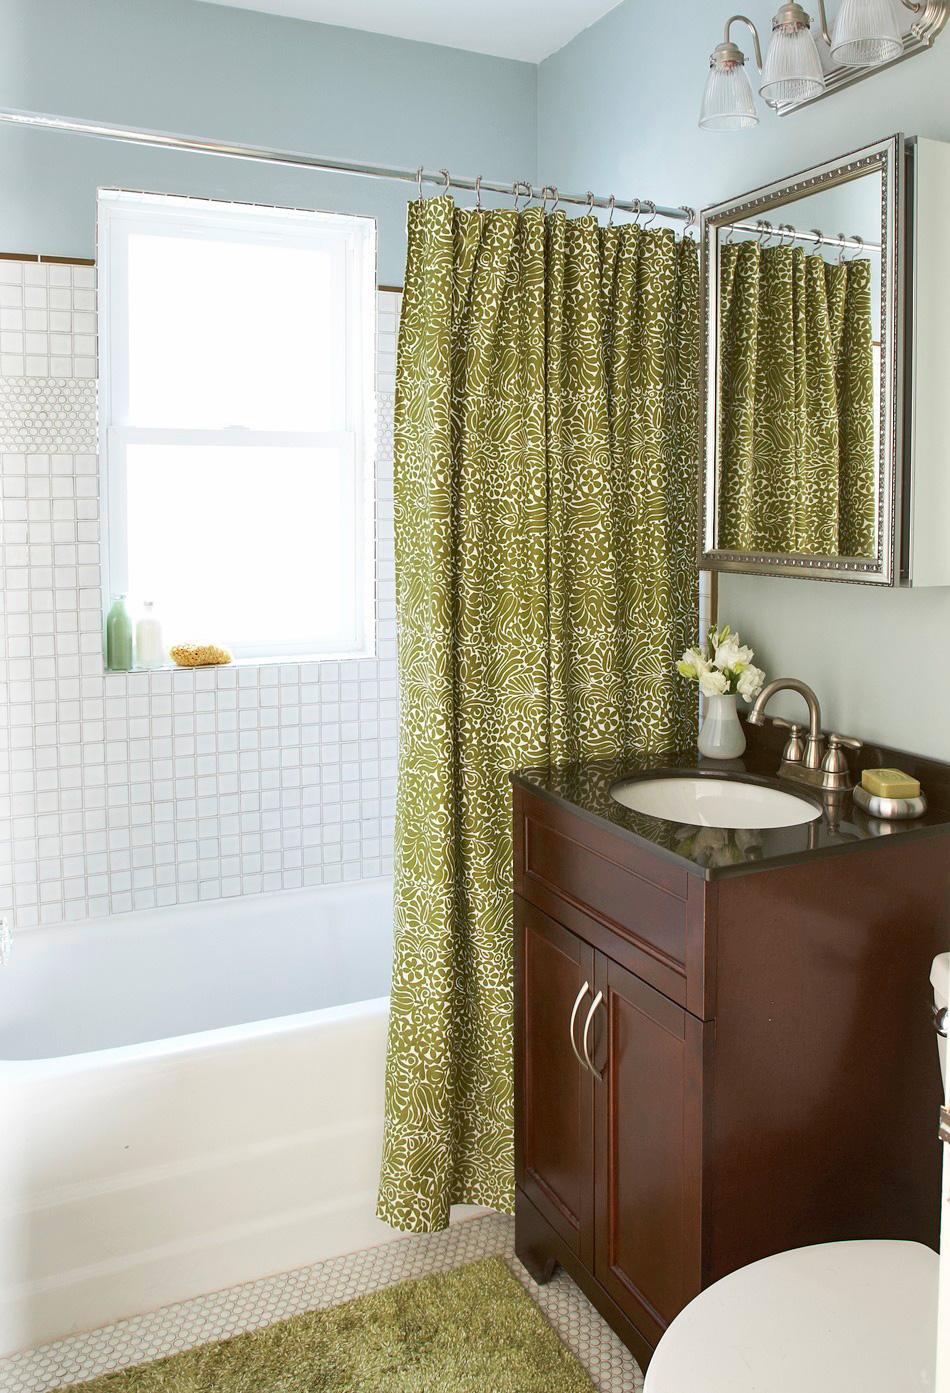 Swap shower curtains